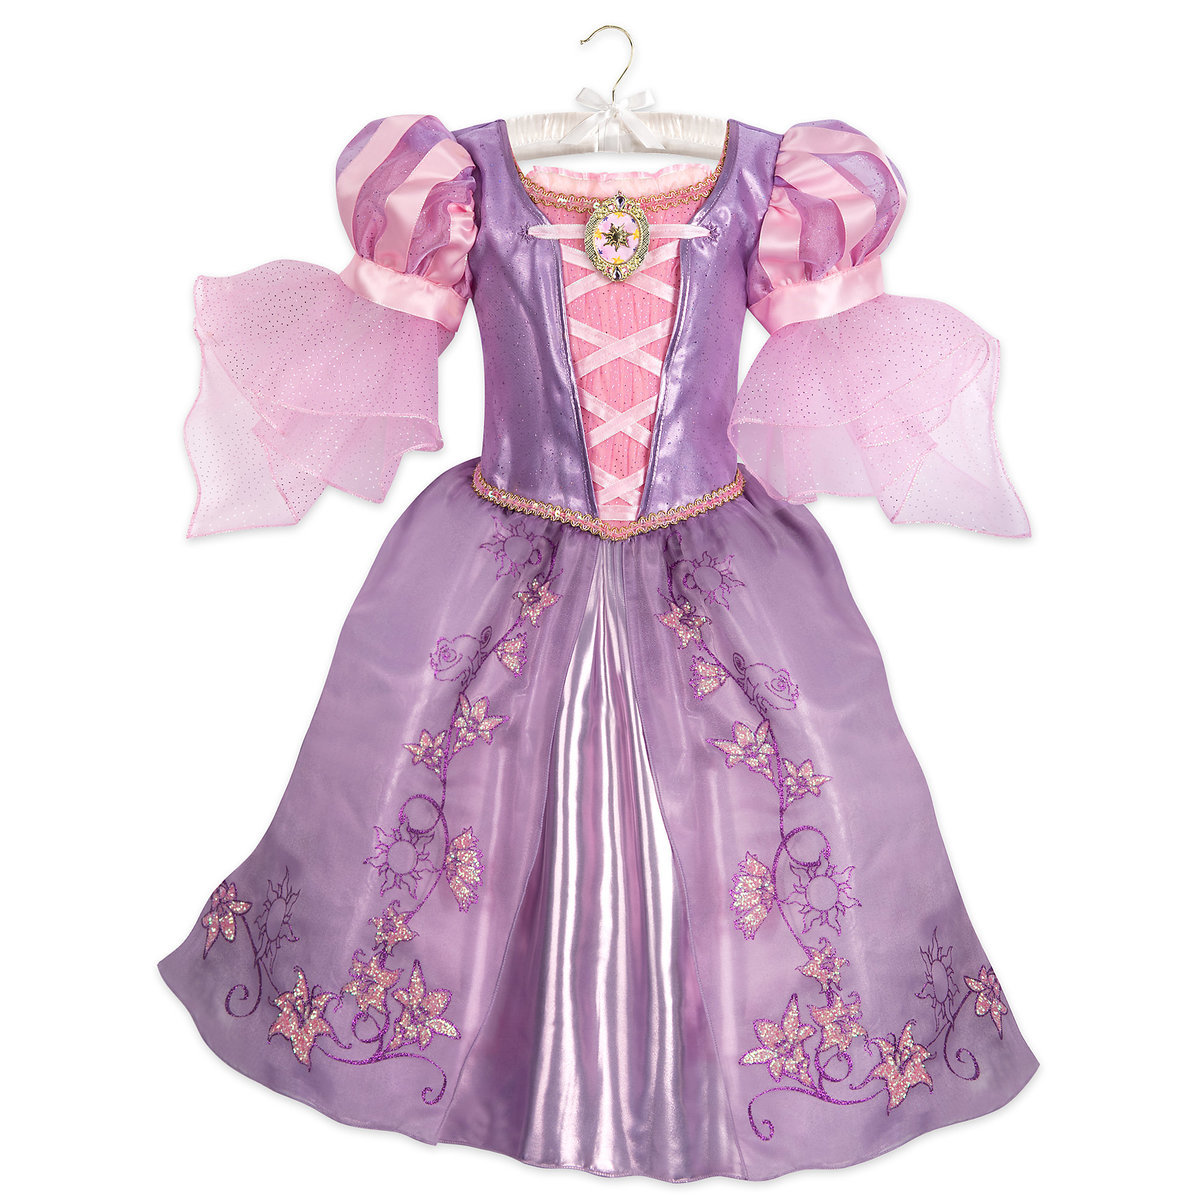 da535fa1418 Product Image of Rapunzel Costume for Kids - Tangled   1